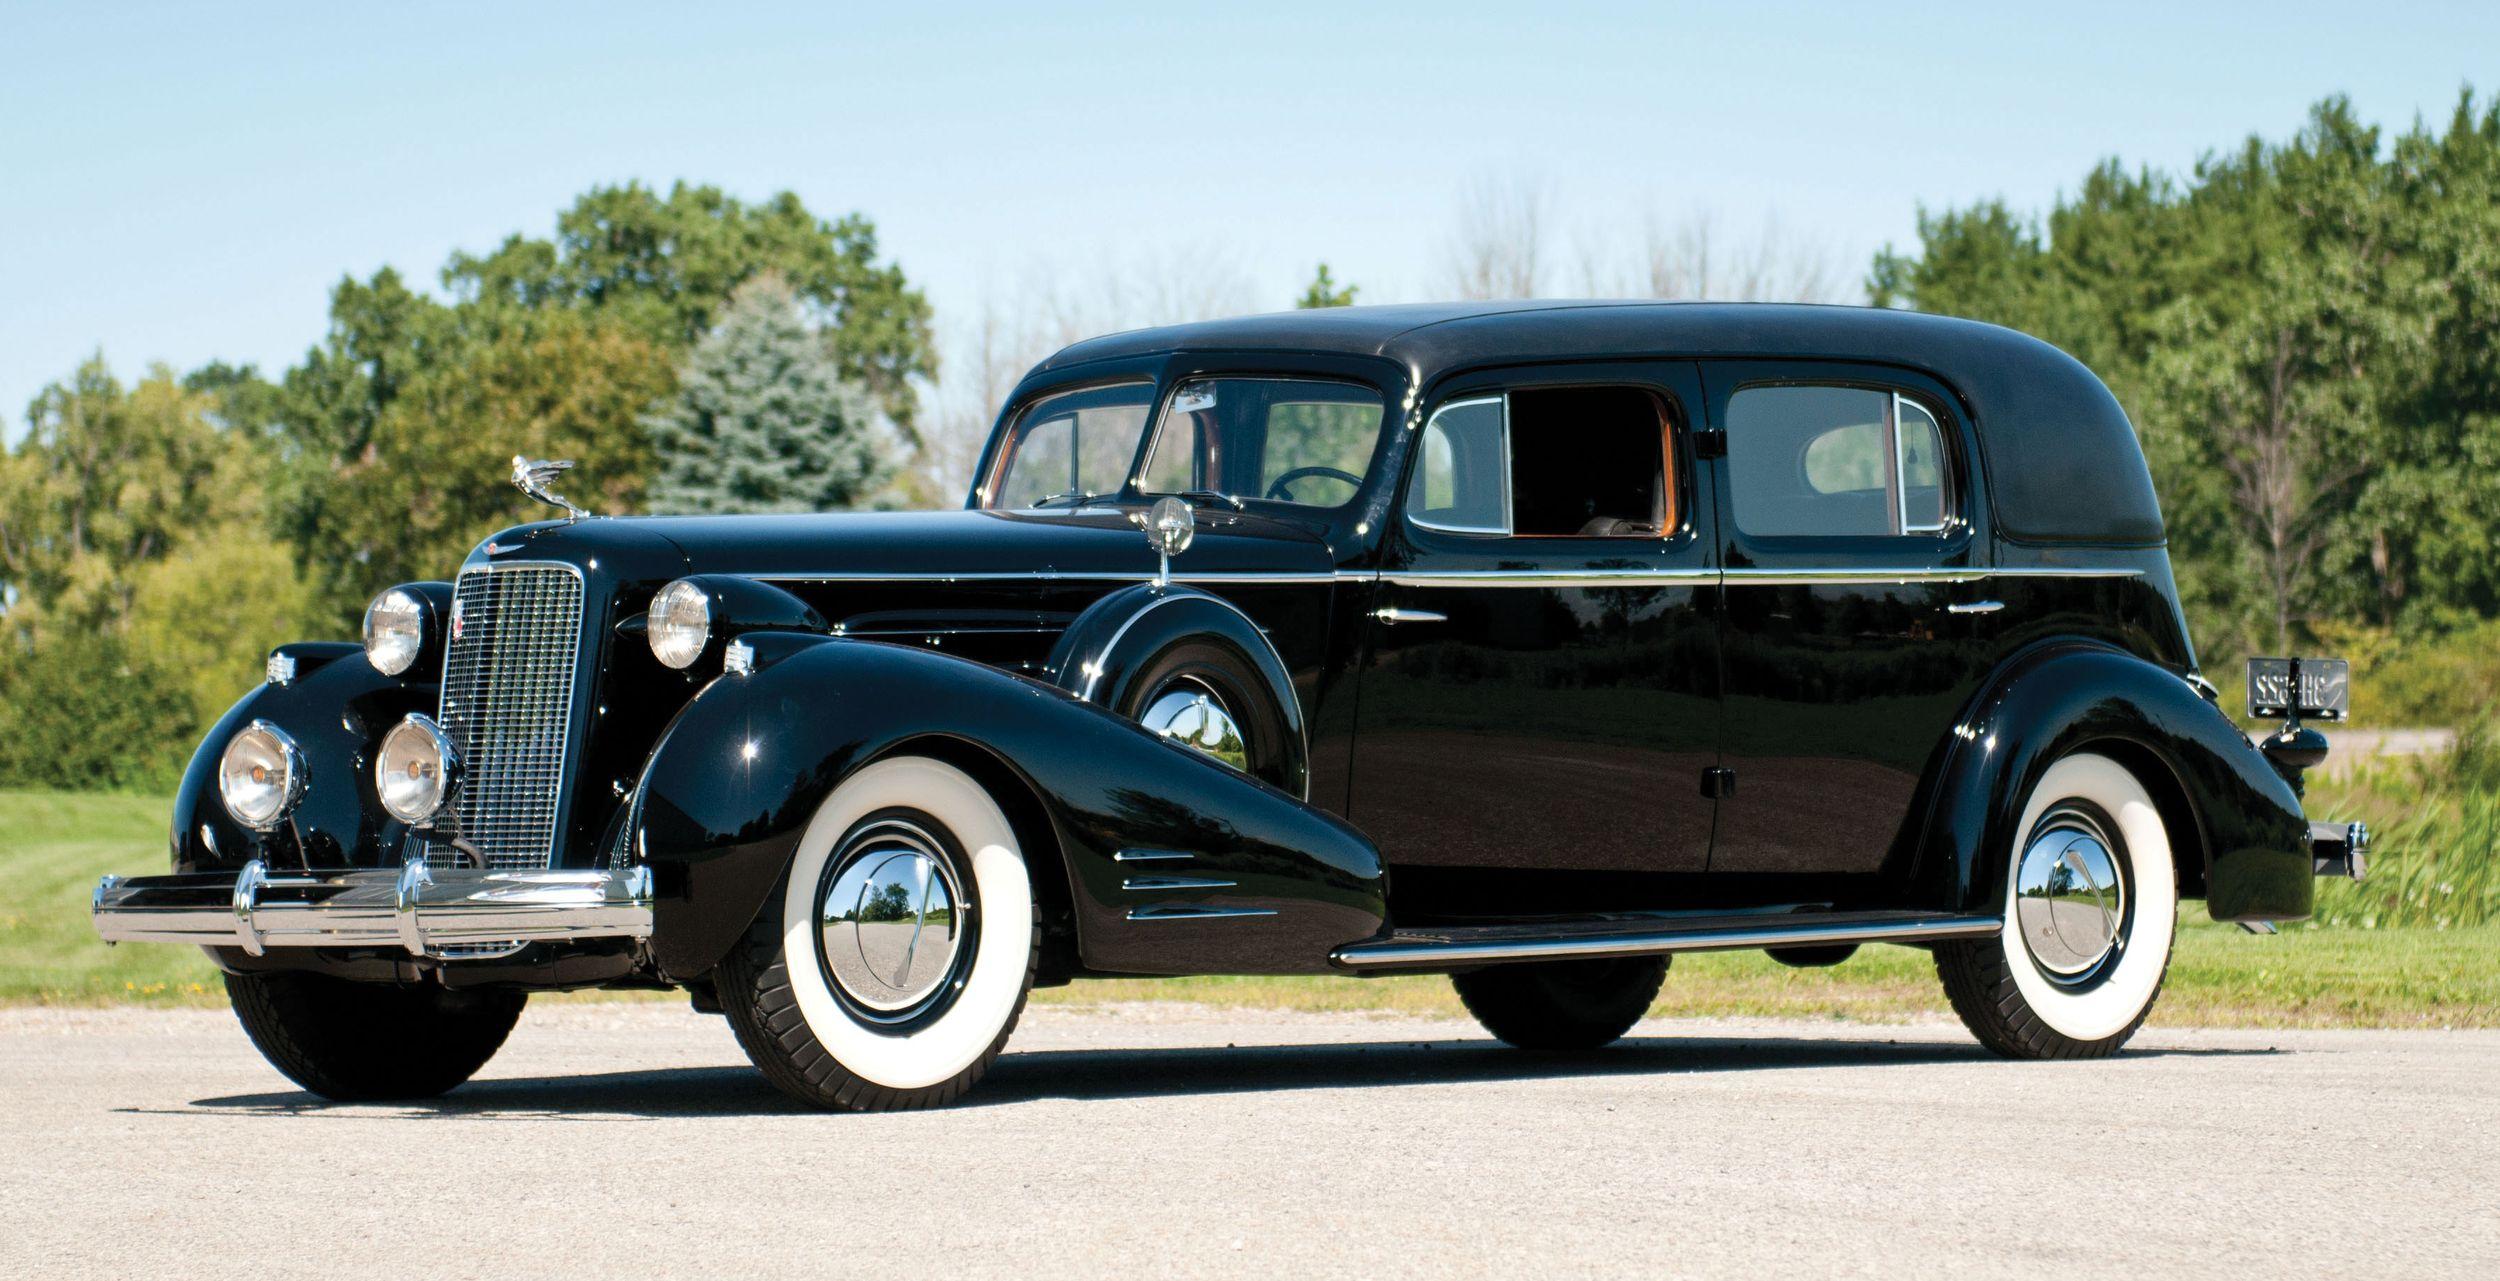 1930 Cadillac V16 Imperial Sedan HD wallpapers, Desktop wallpaper - most viewed